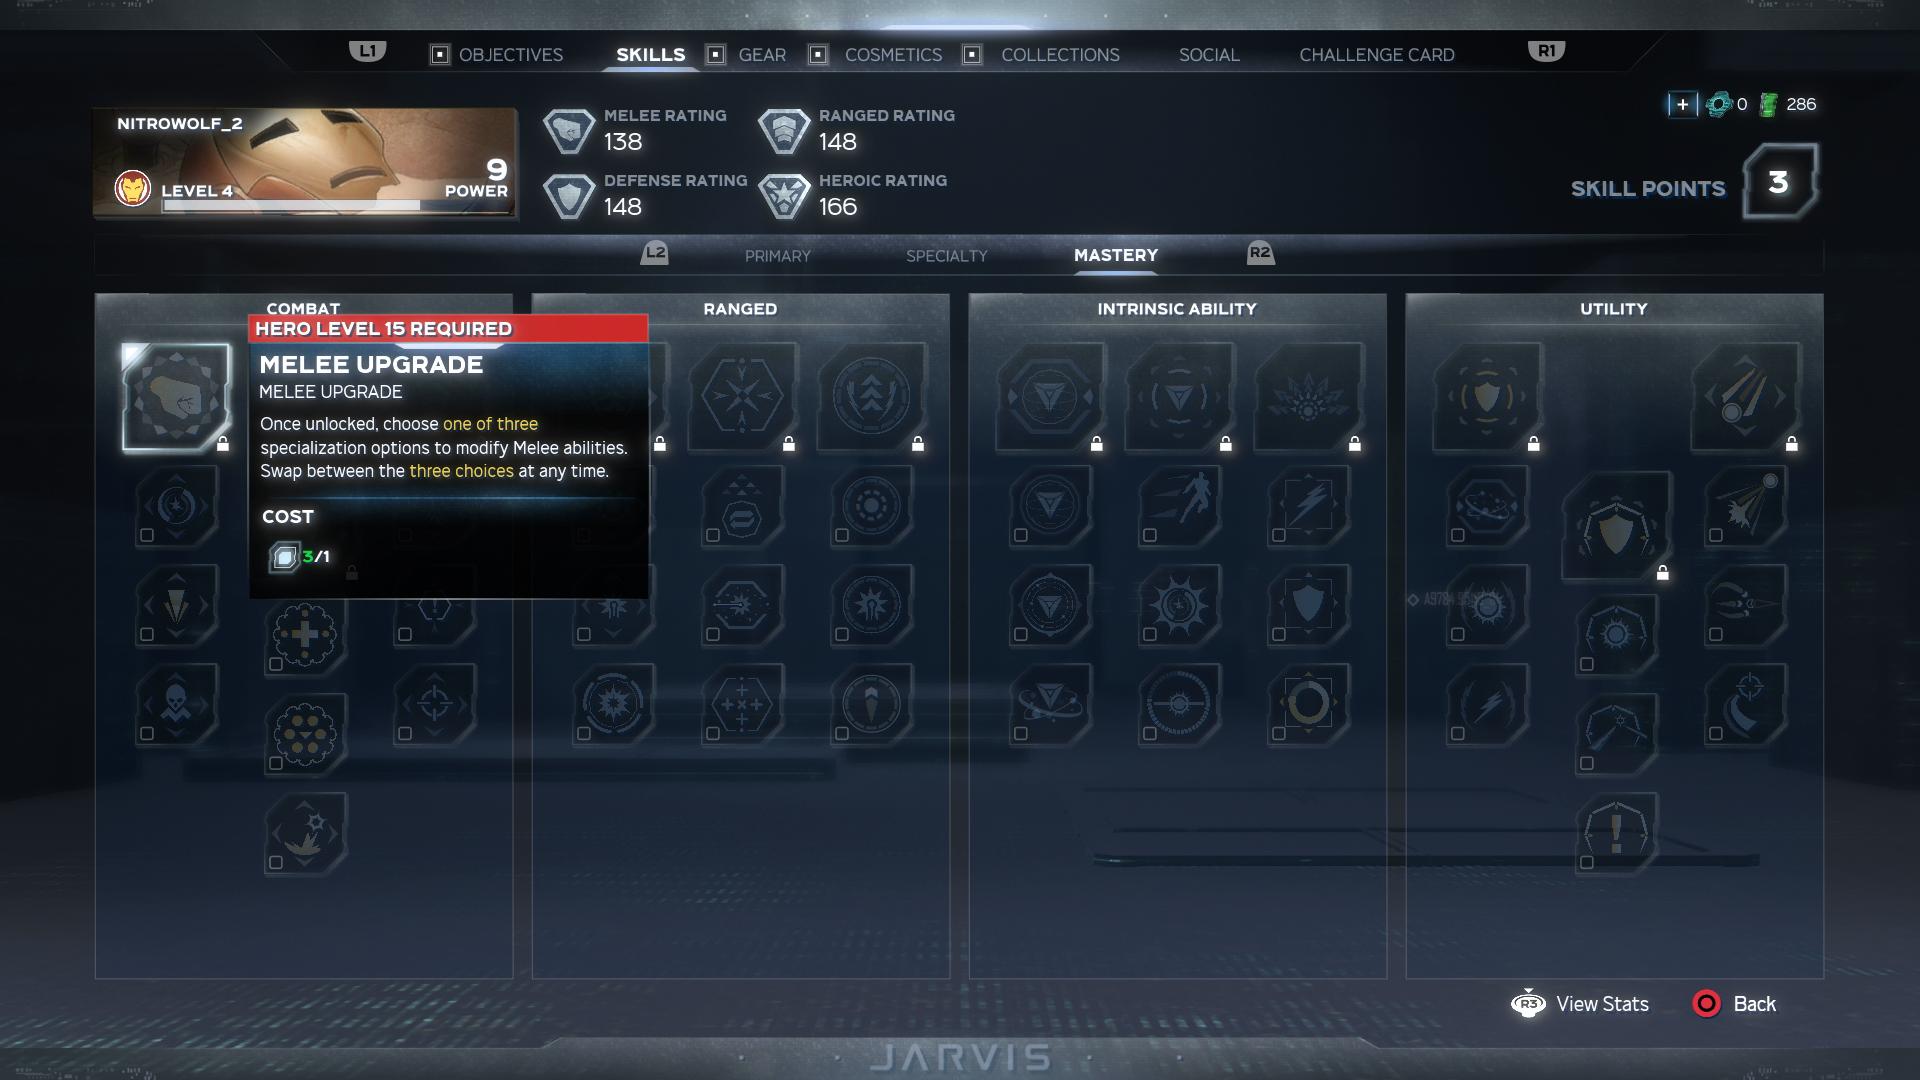 Avengers Game Skill Tree Captain America Skills Mastery (1)